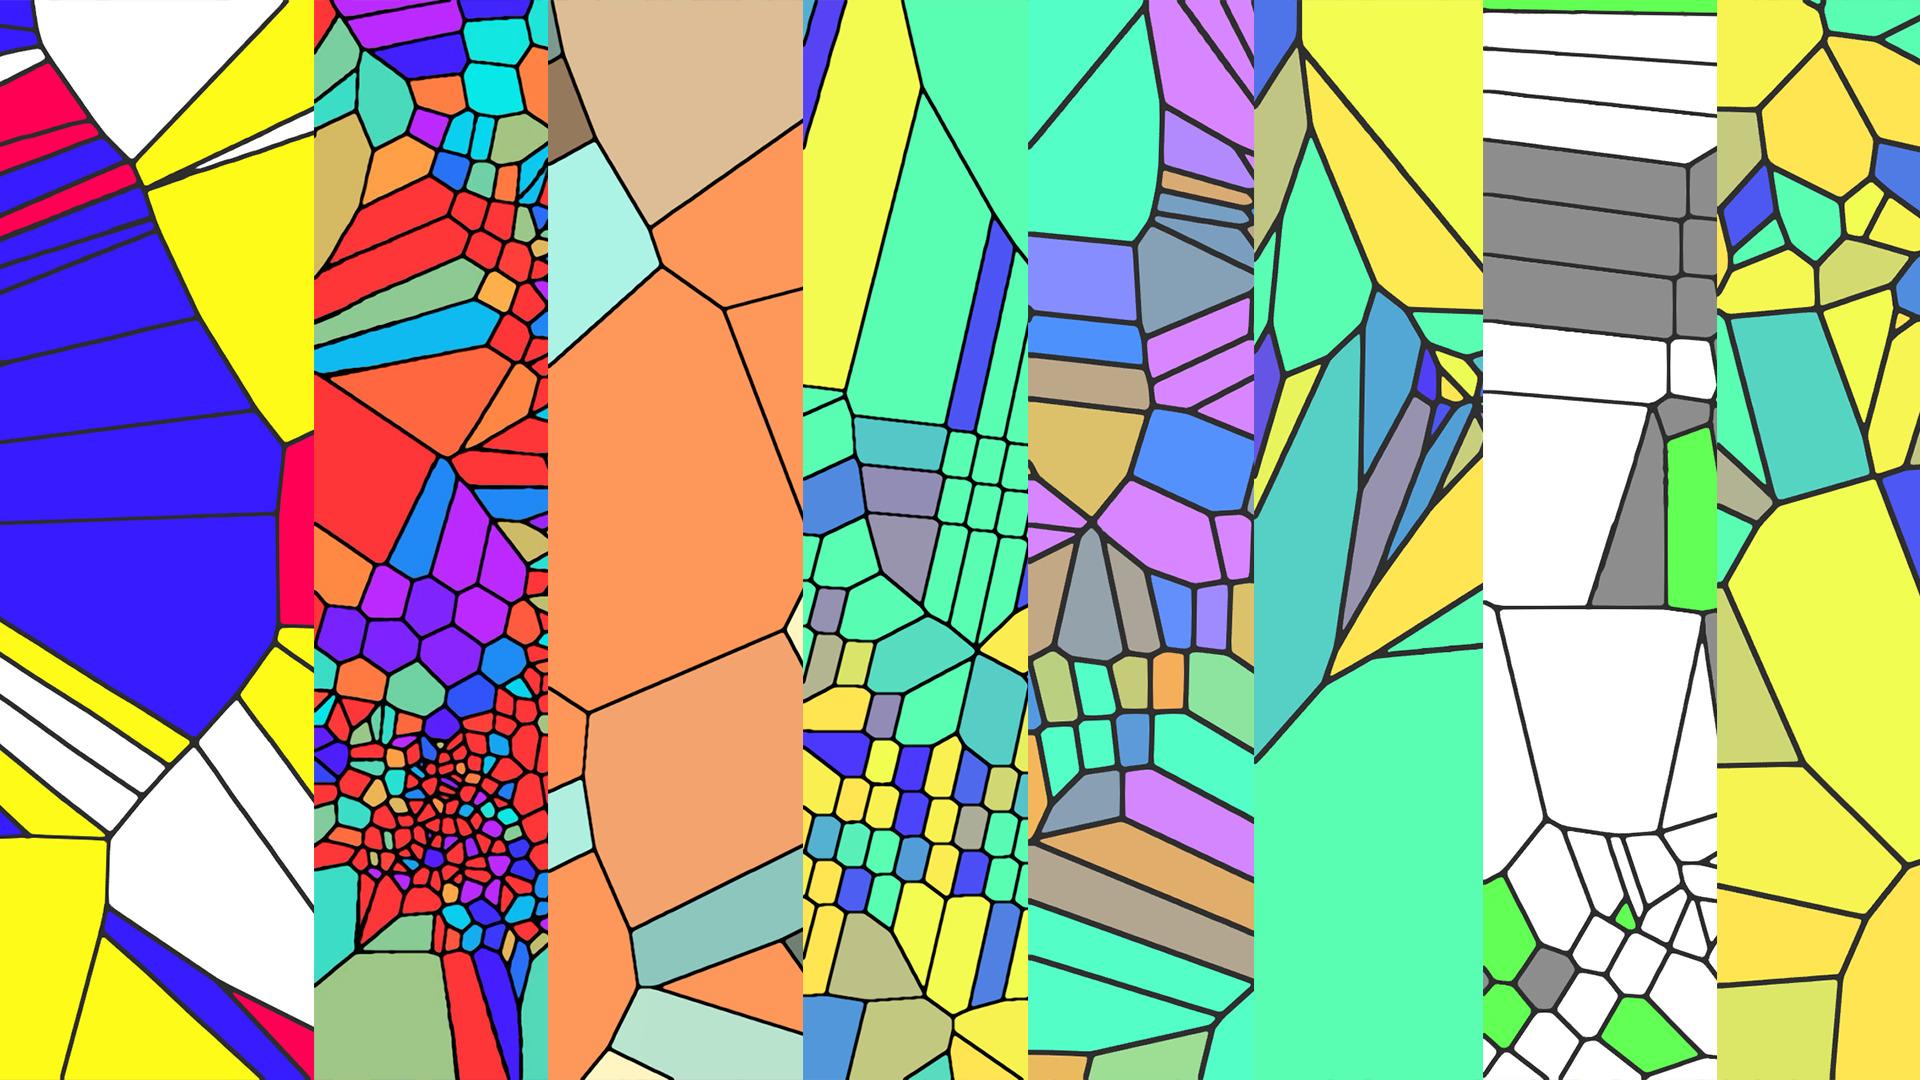 Touchdesigner Generative Animation - Voronoi